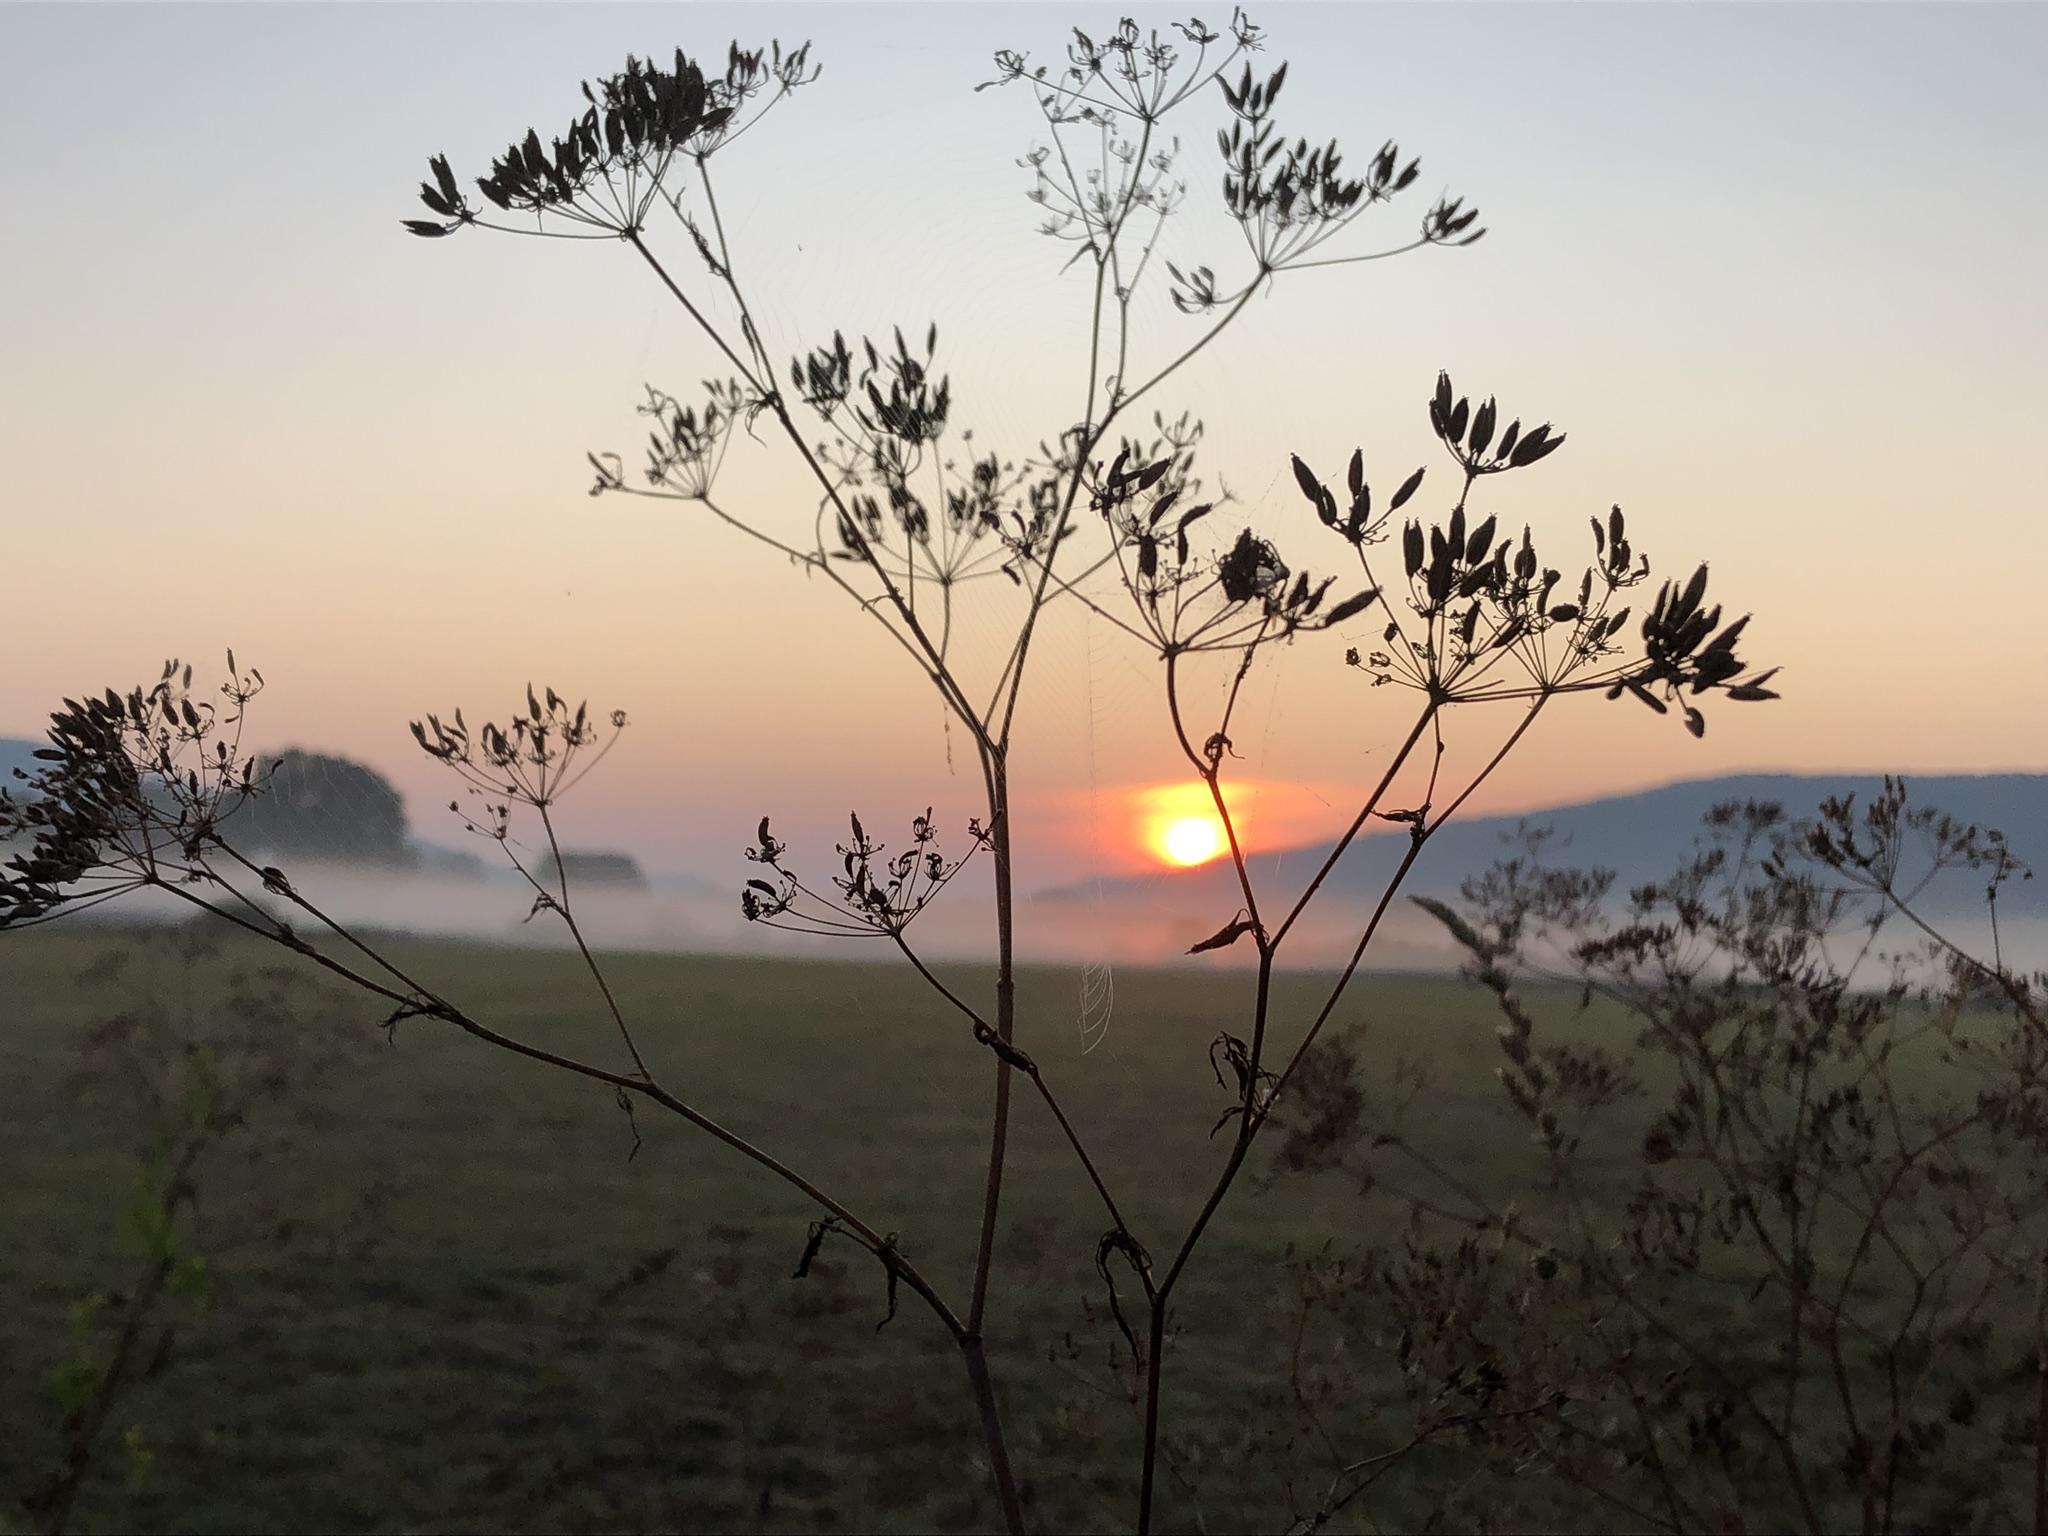 Sonnenaufgang in den Emmerwiesen